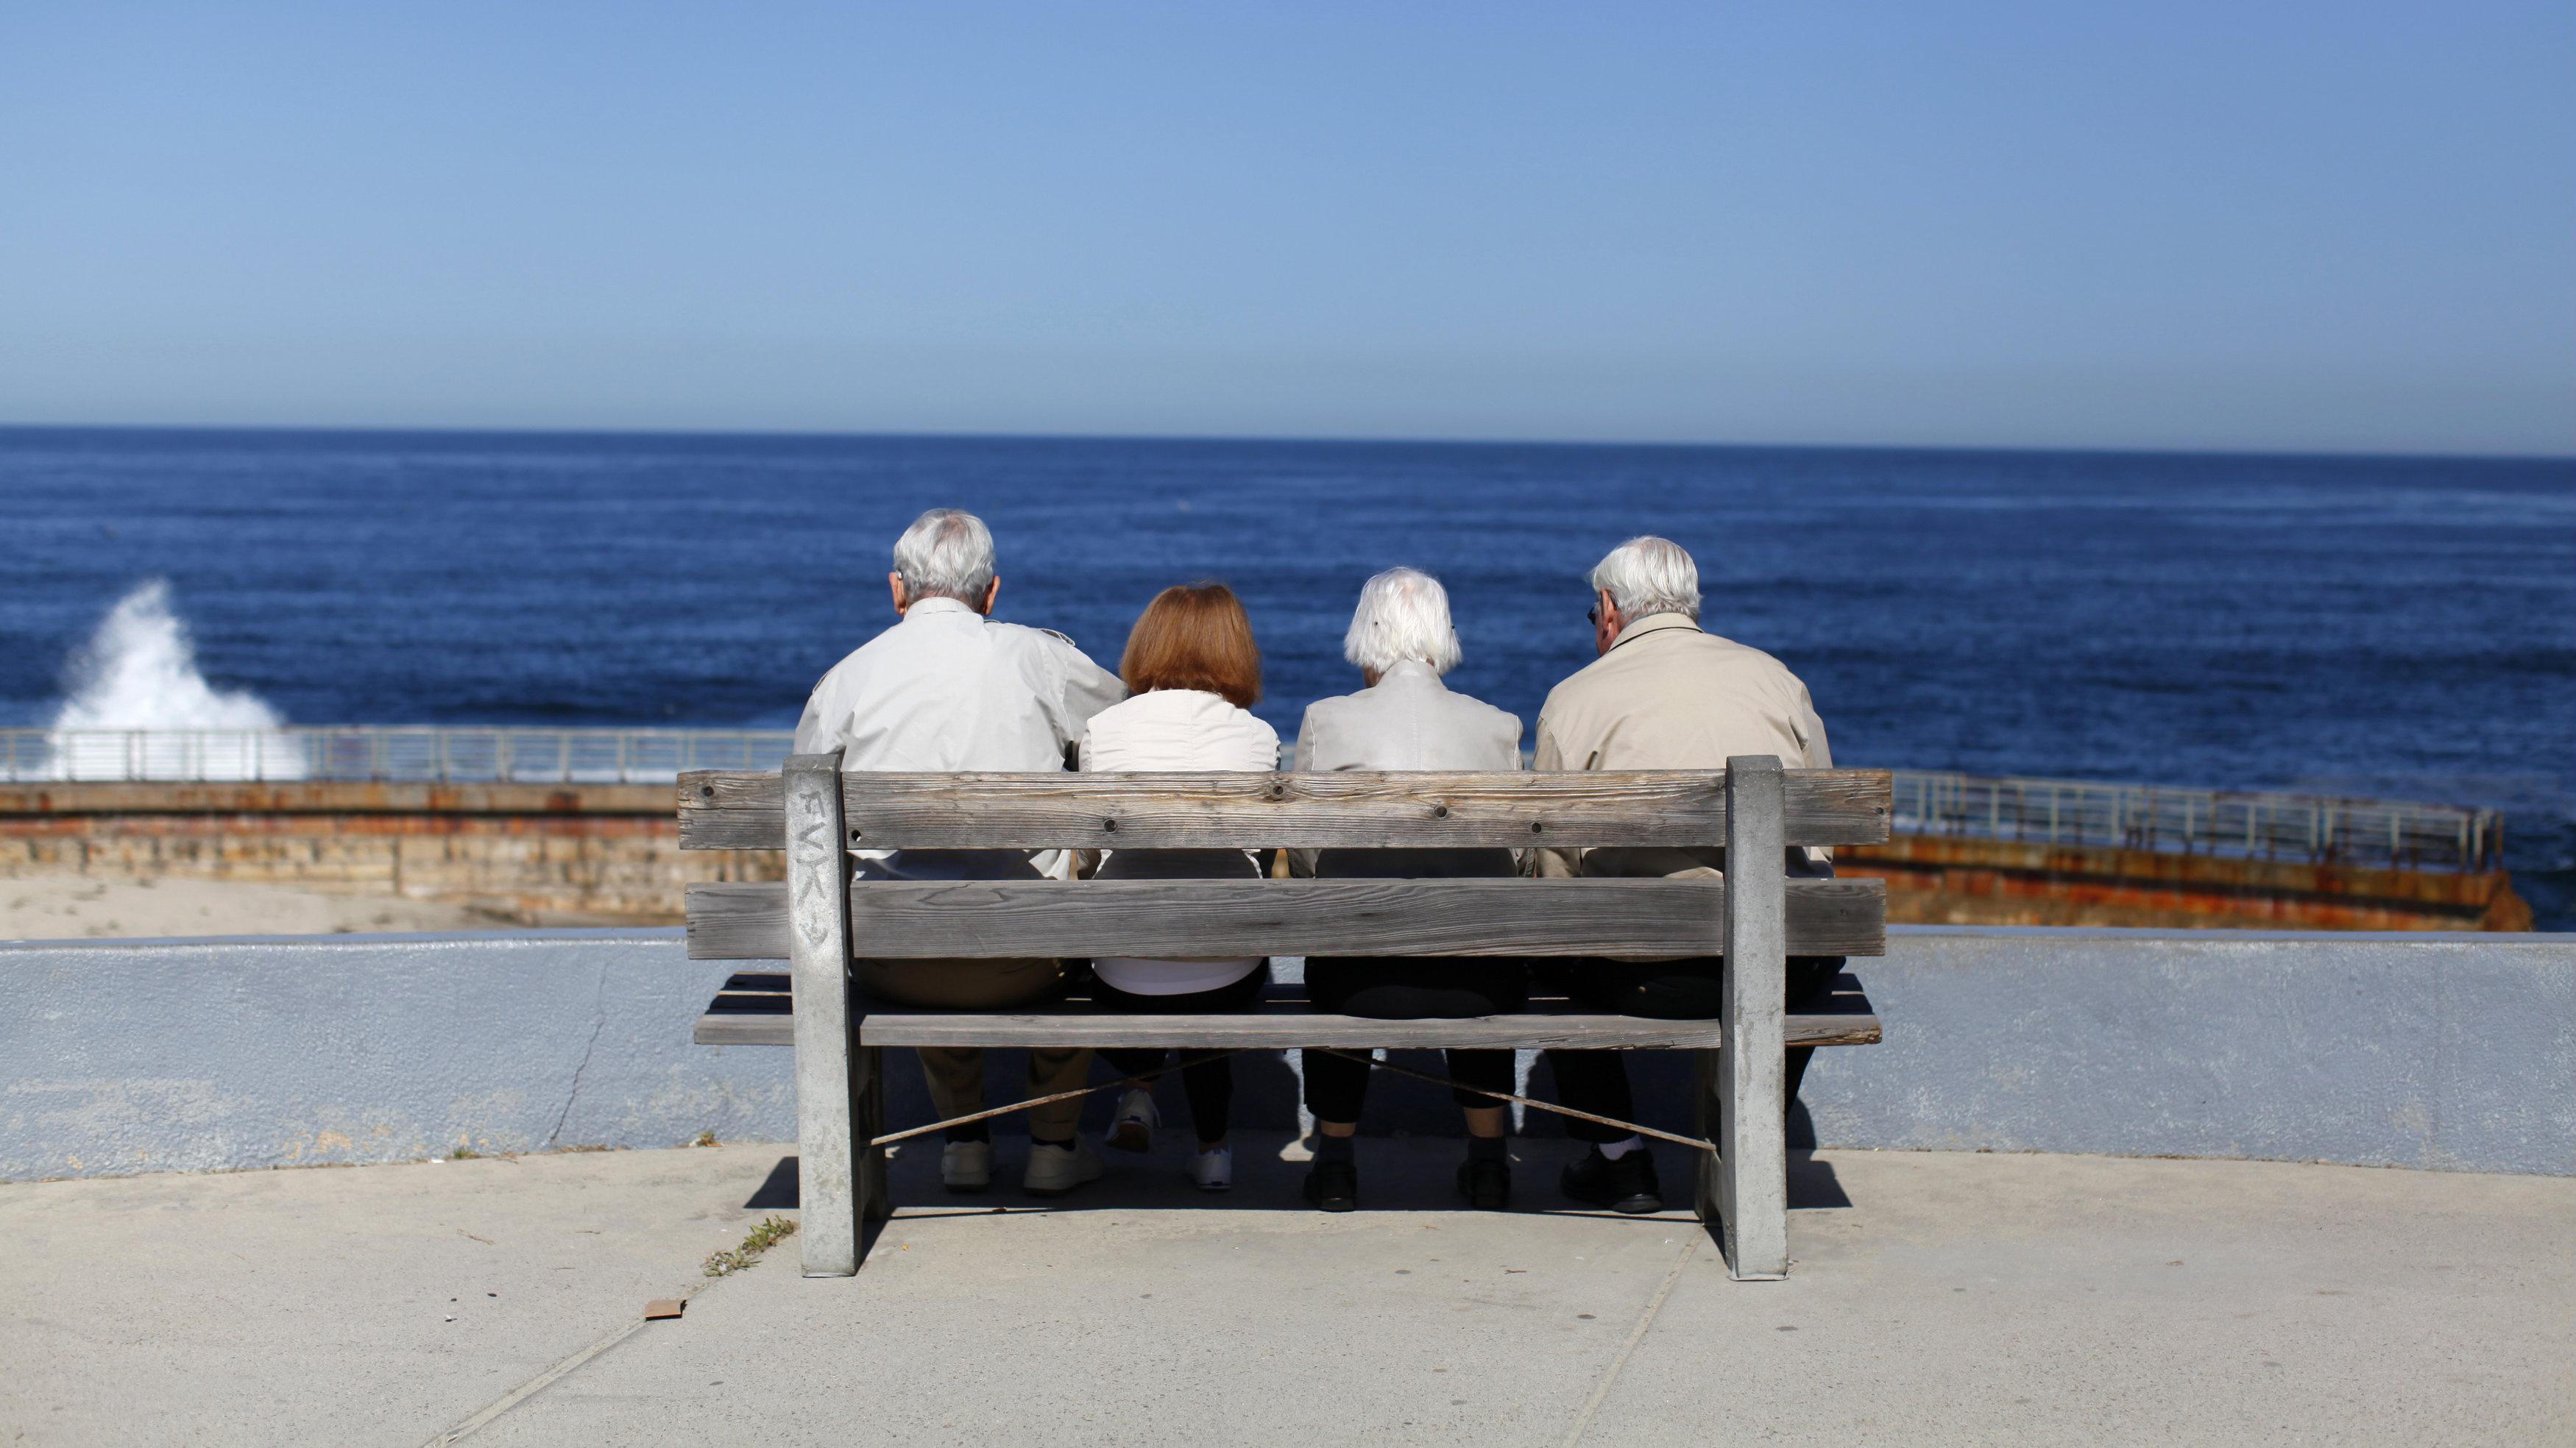 Elderly on a bench